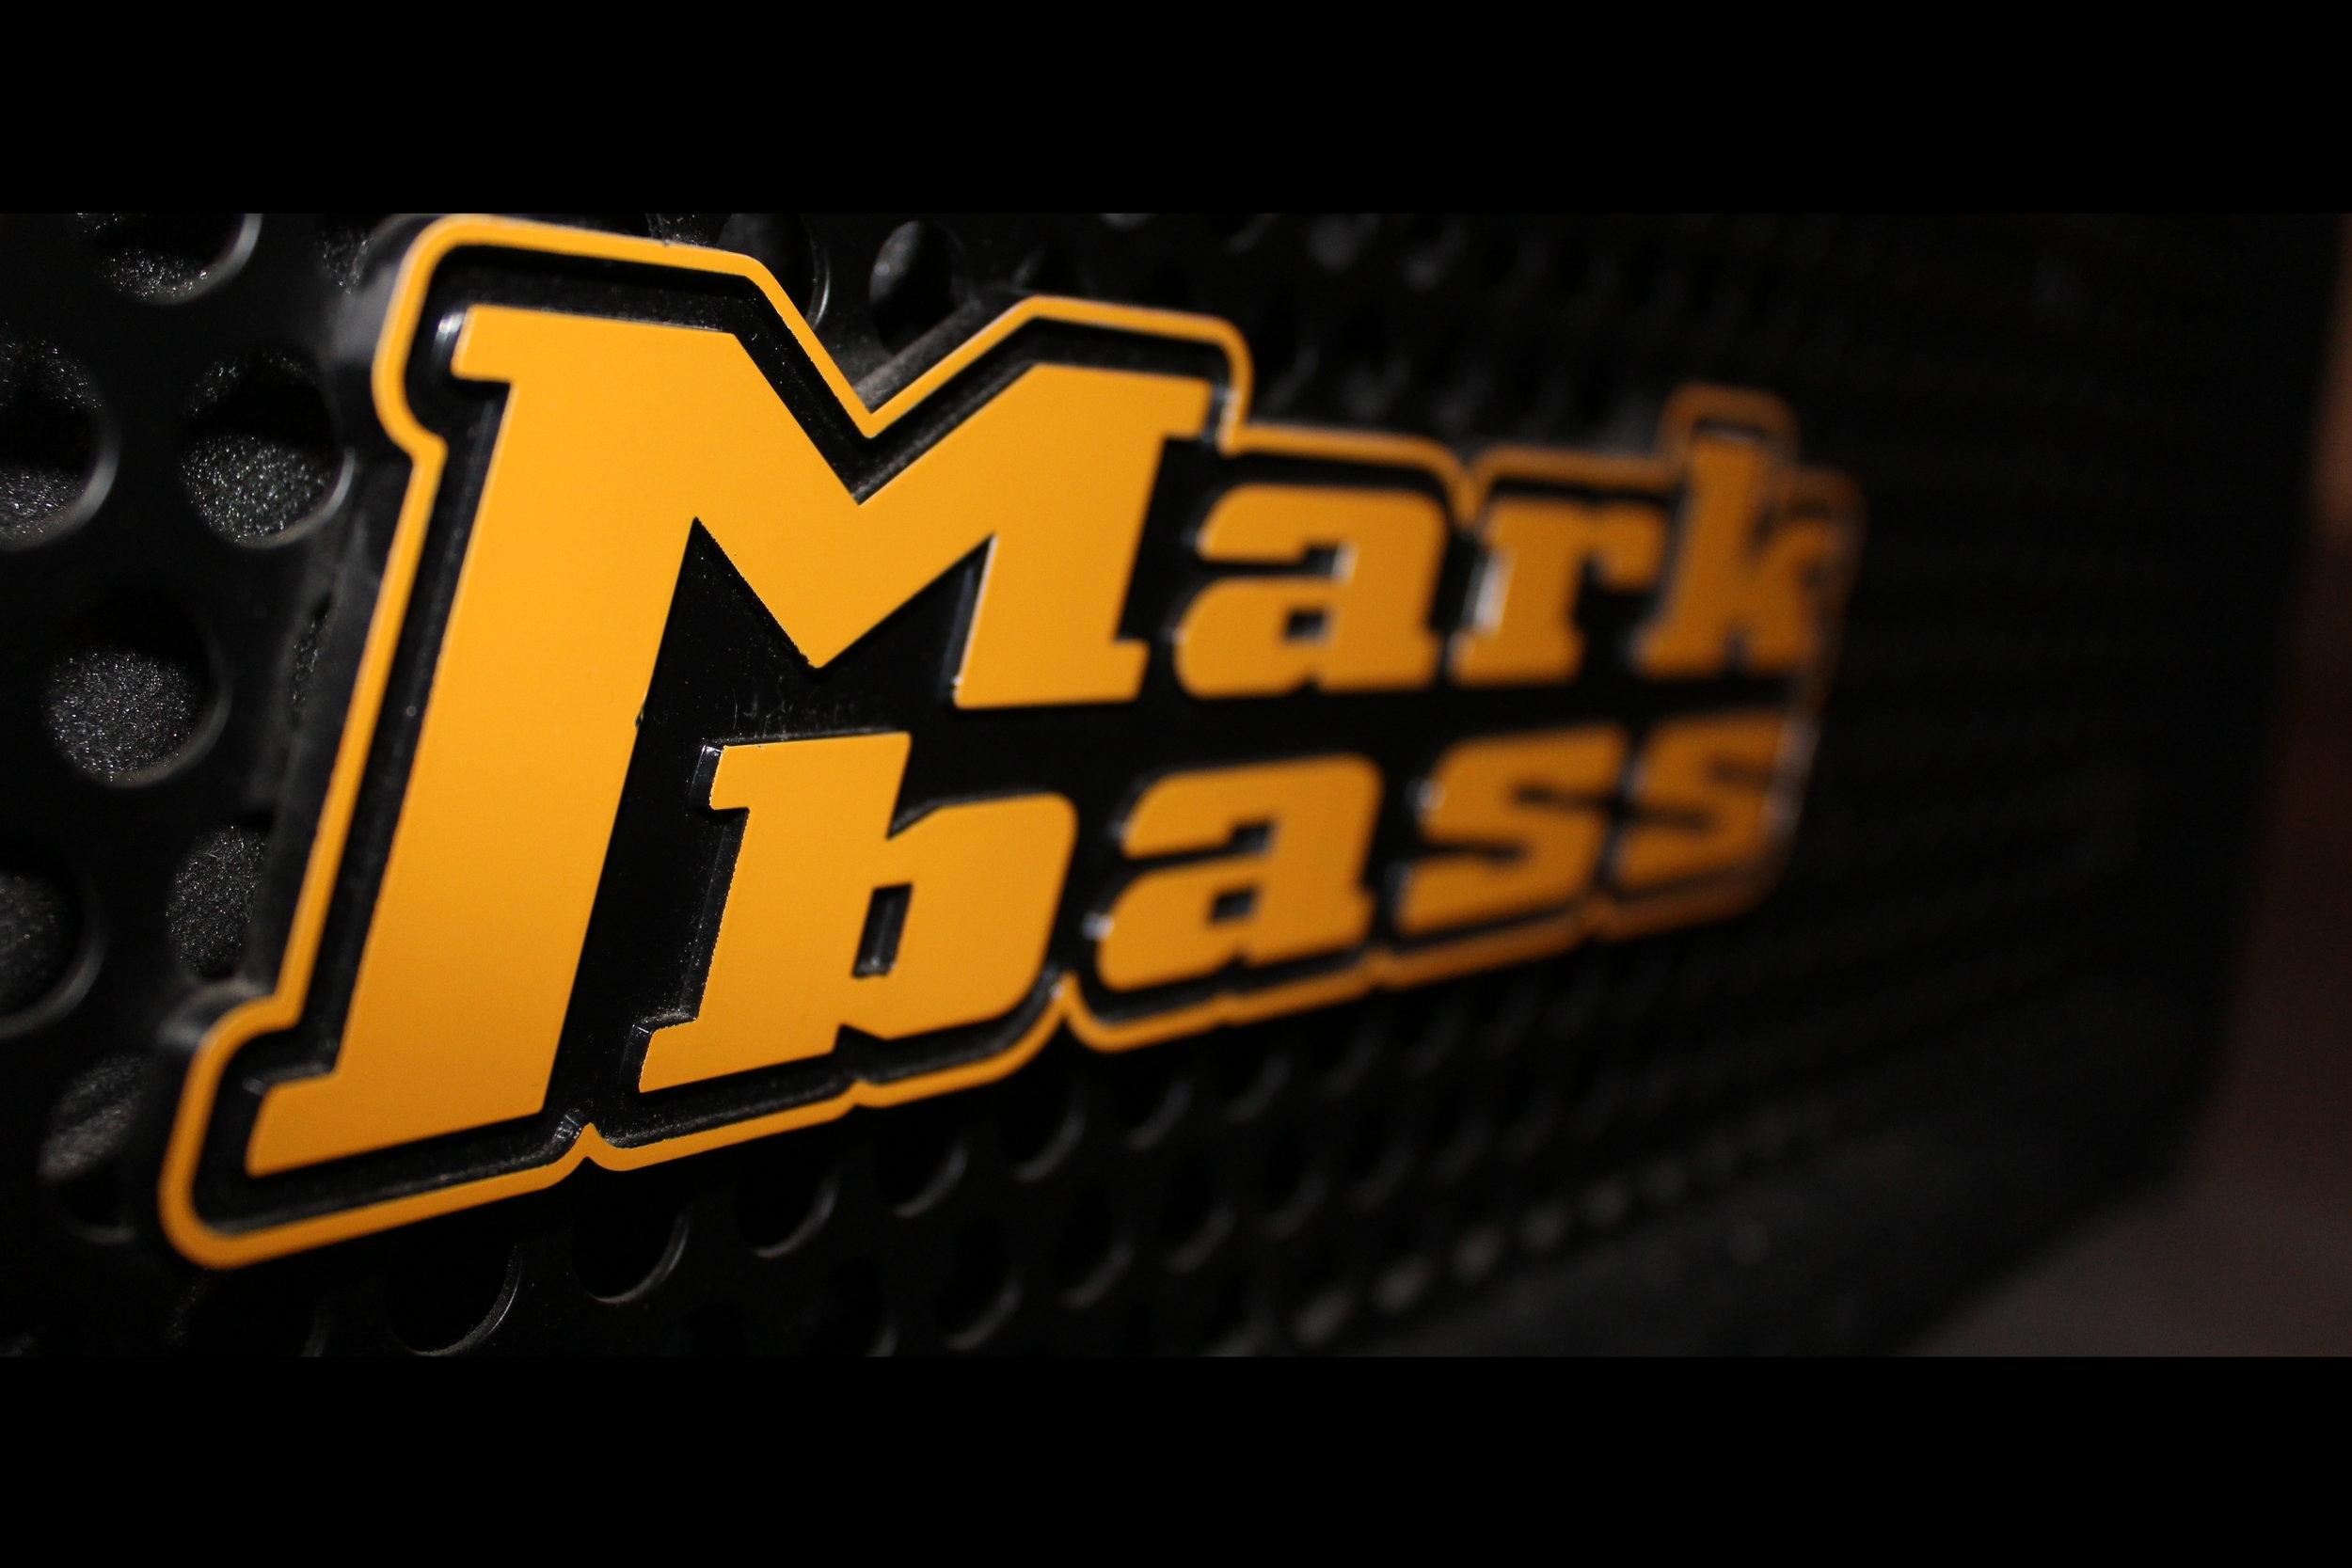 4 x 10 MarkBass Cab